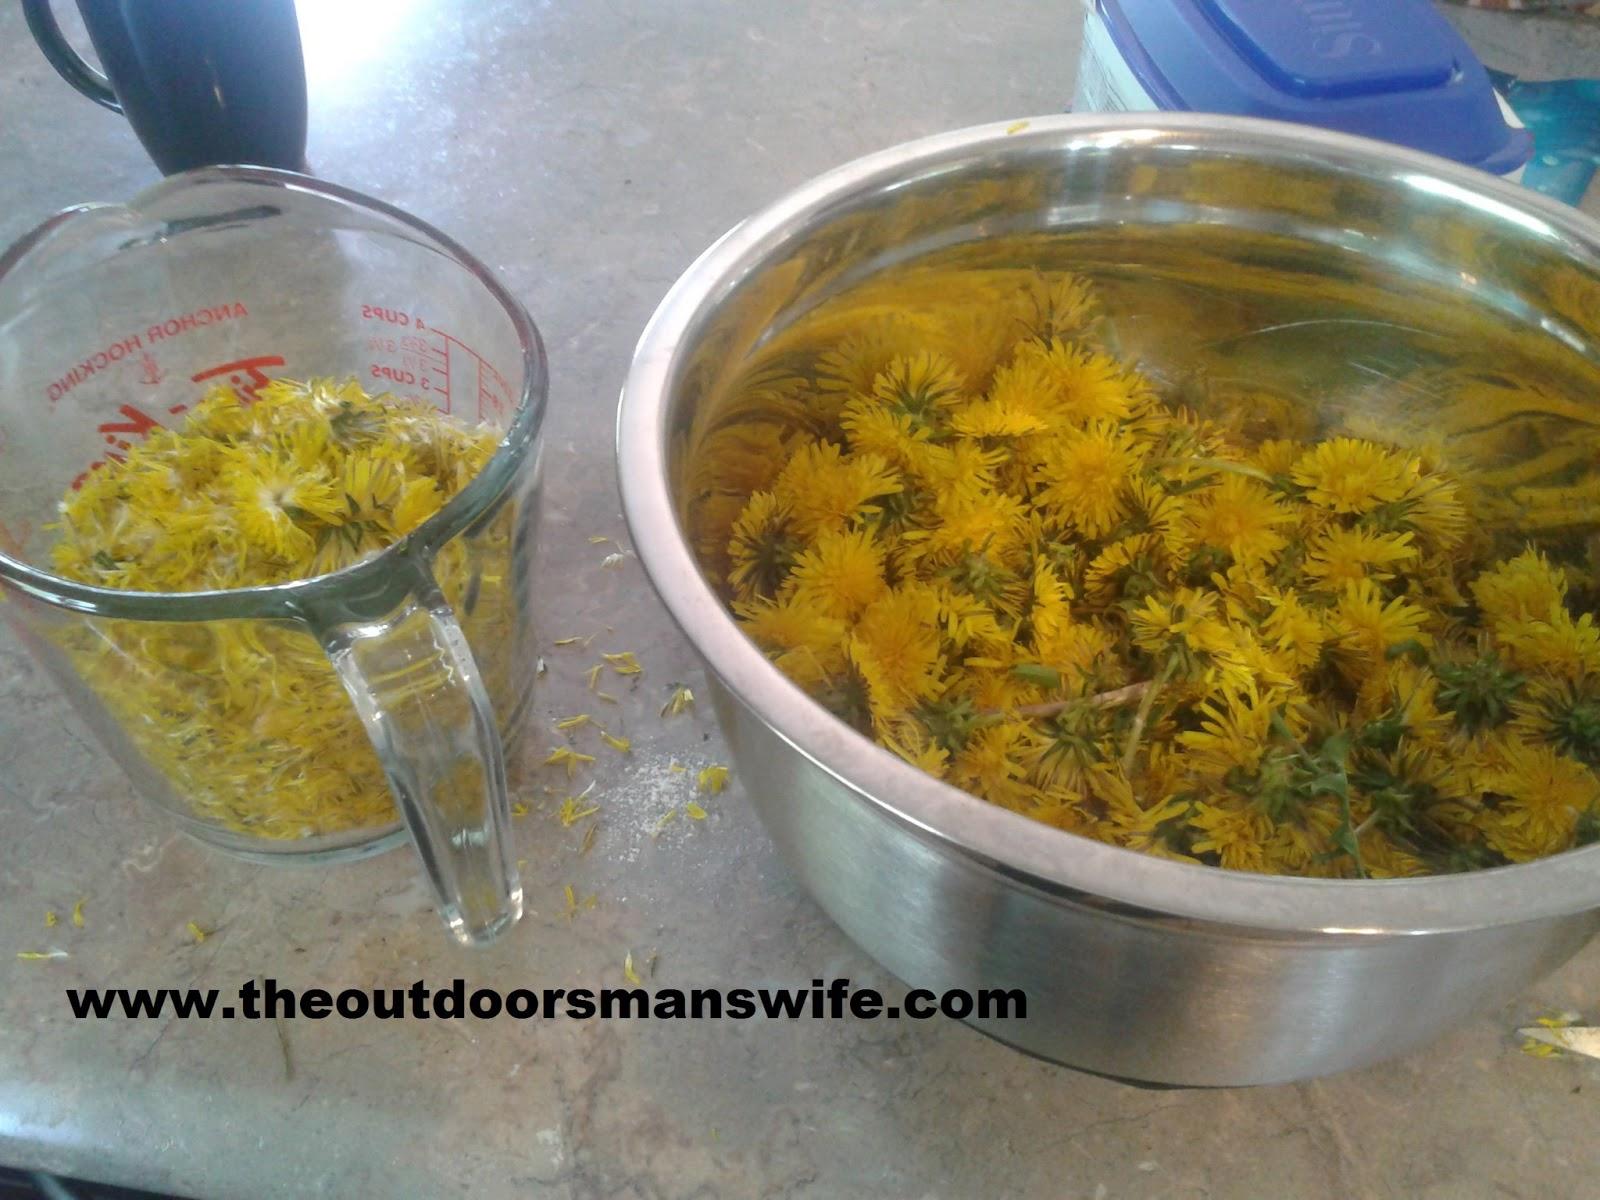 Preparing dandelions for wine